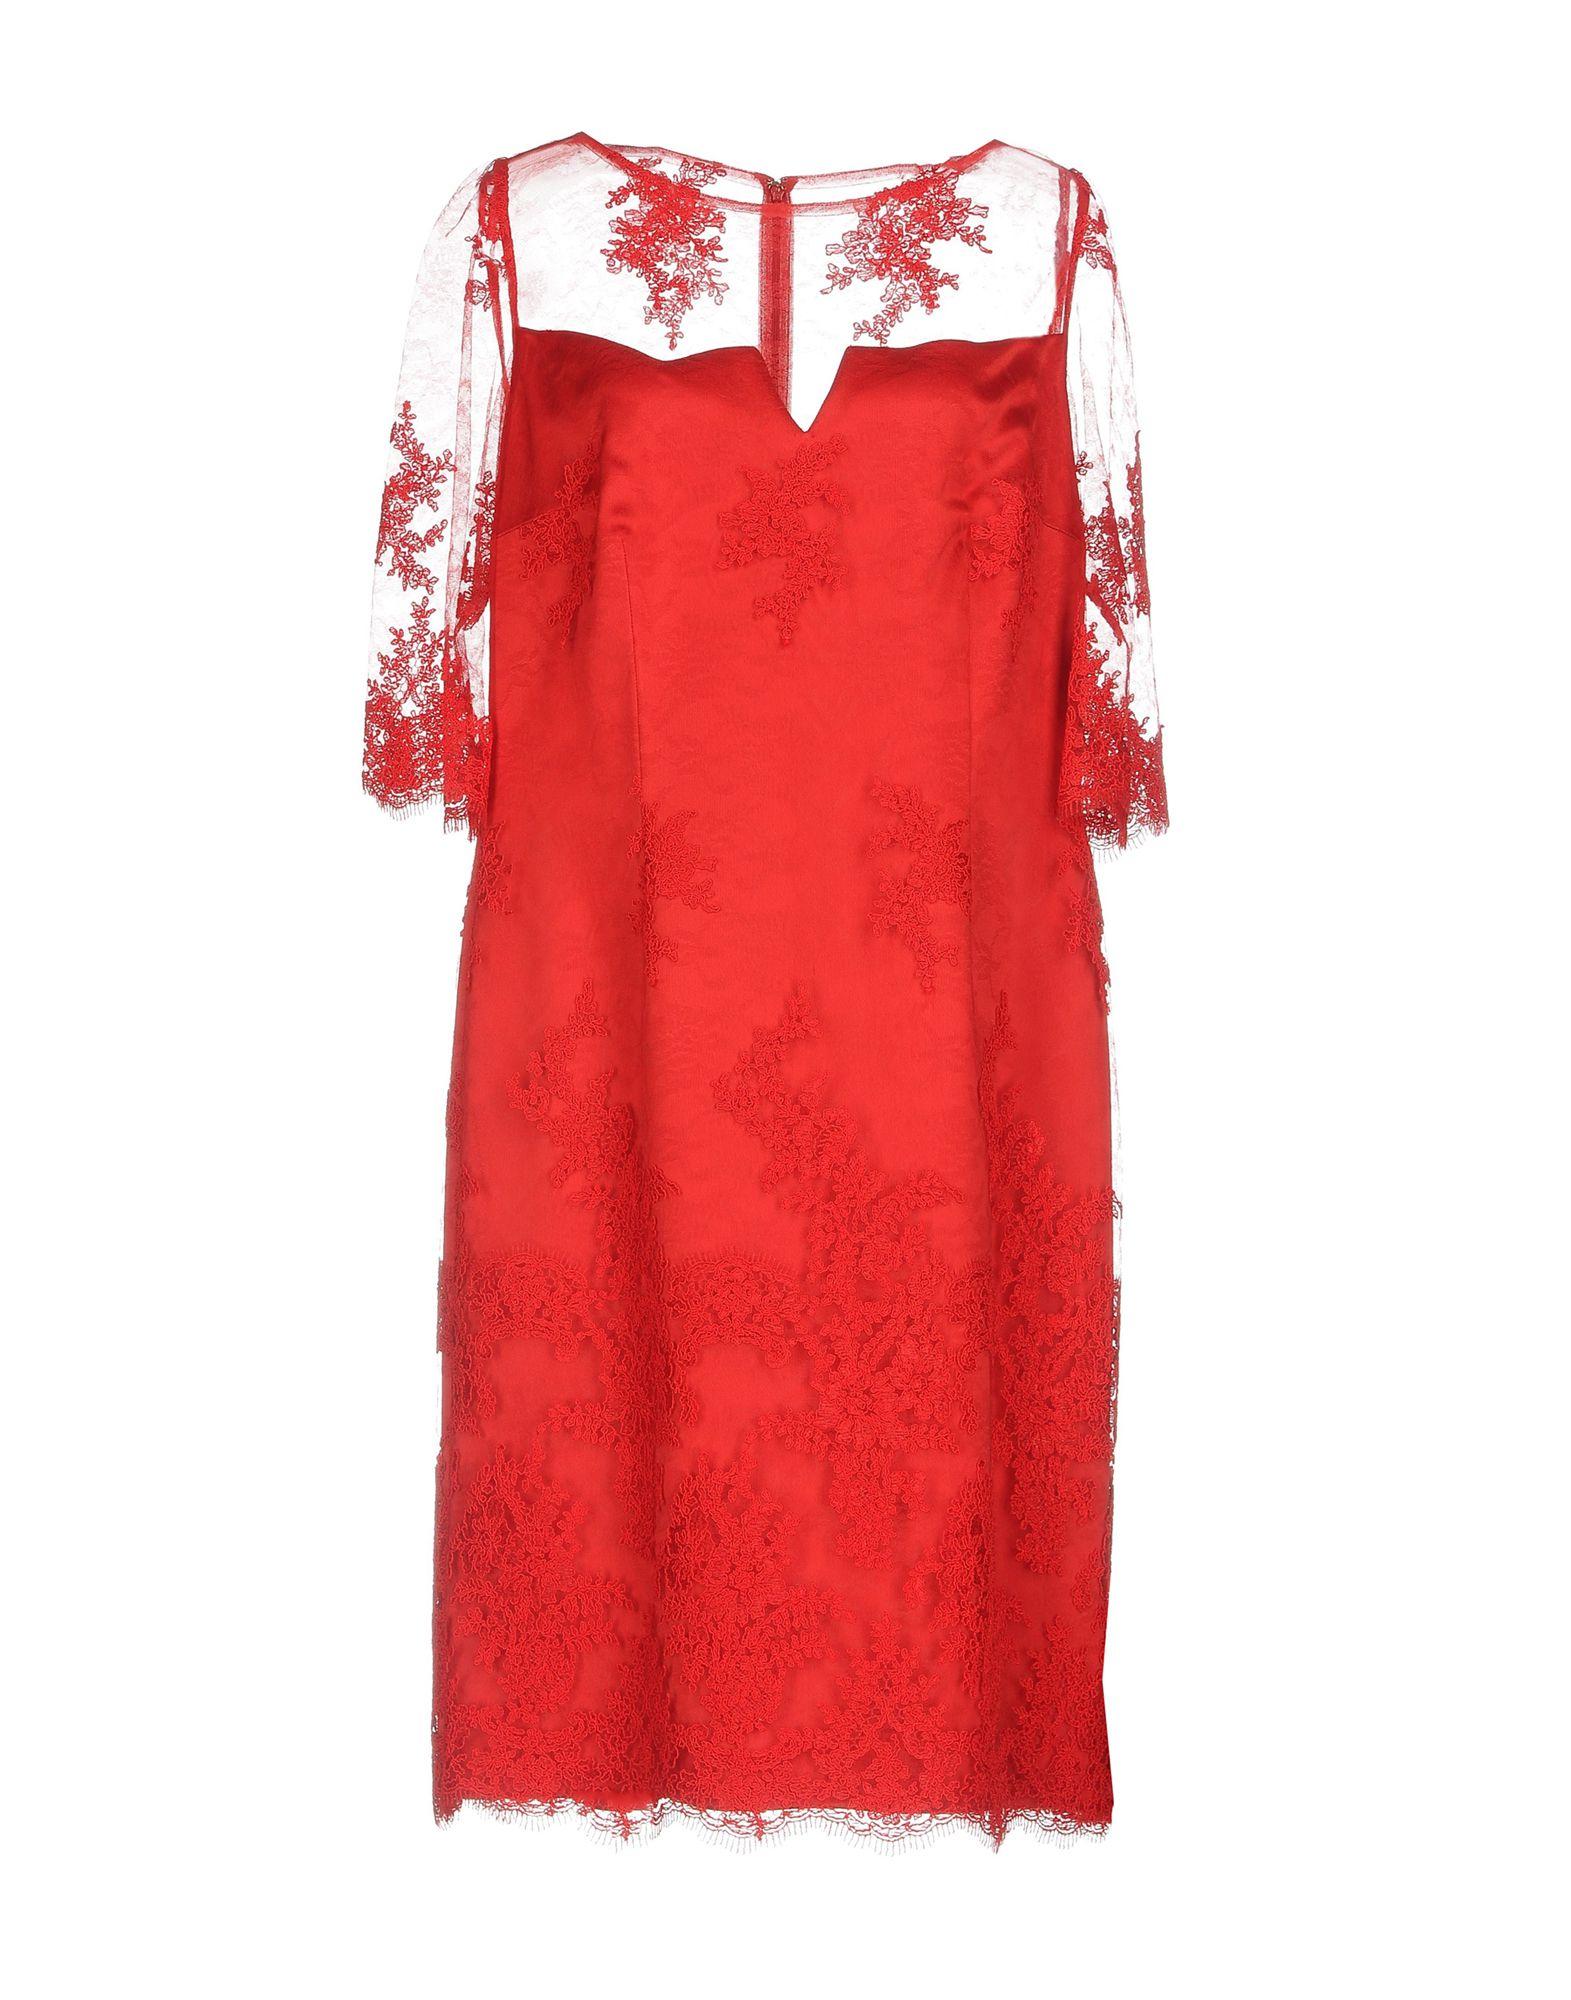 PIEDAD RODRIGUEZ | PIEDAD RODRIGUEZ Short dresses 34806397 | Goxip